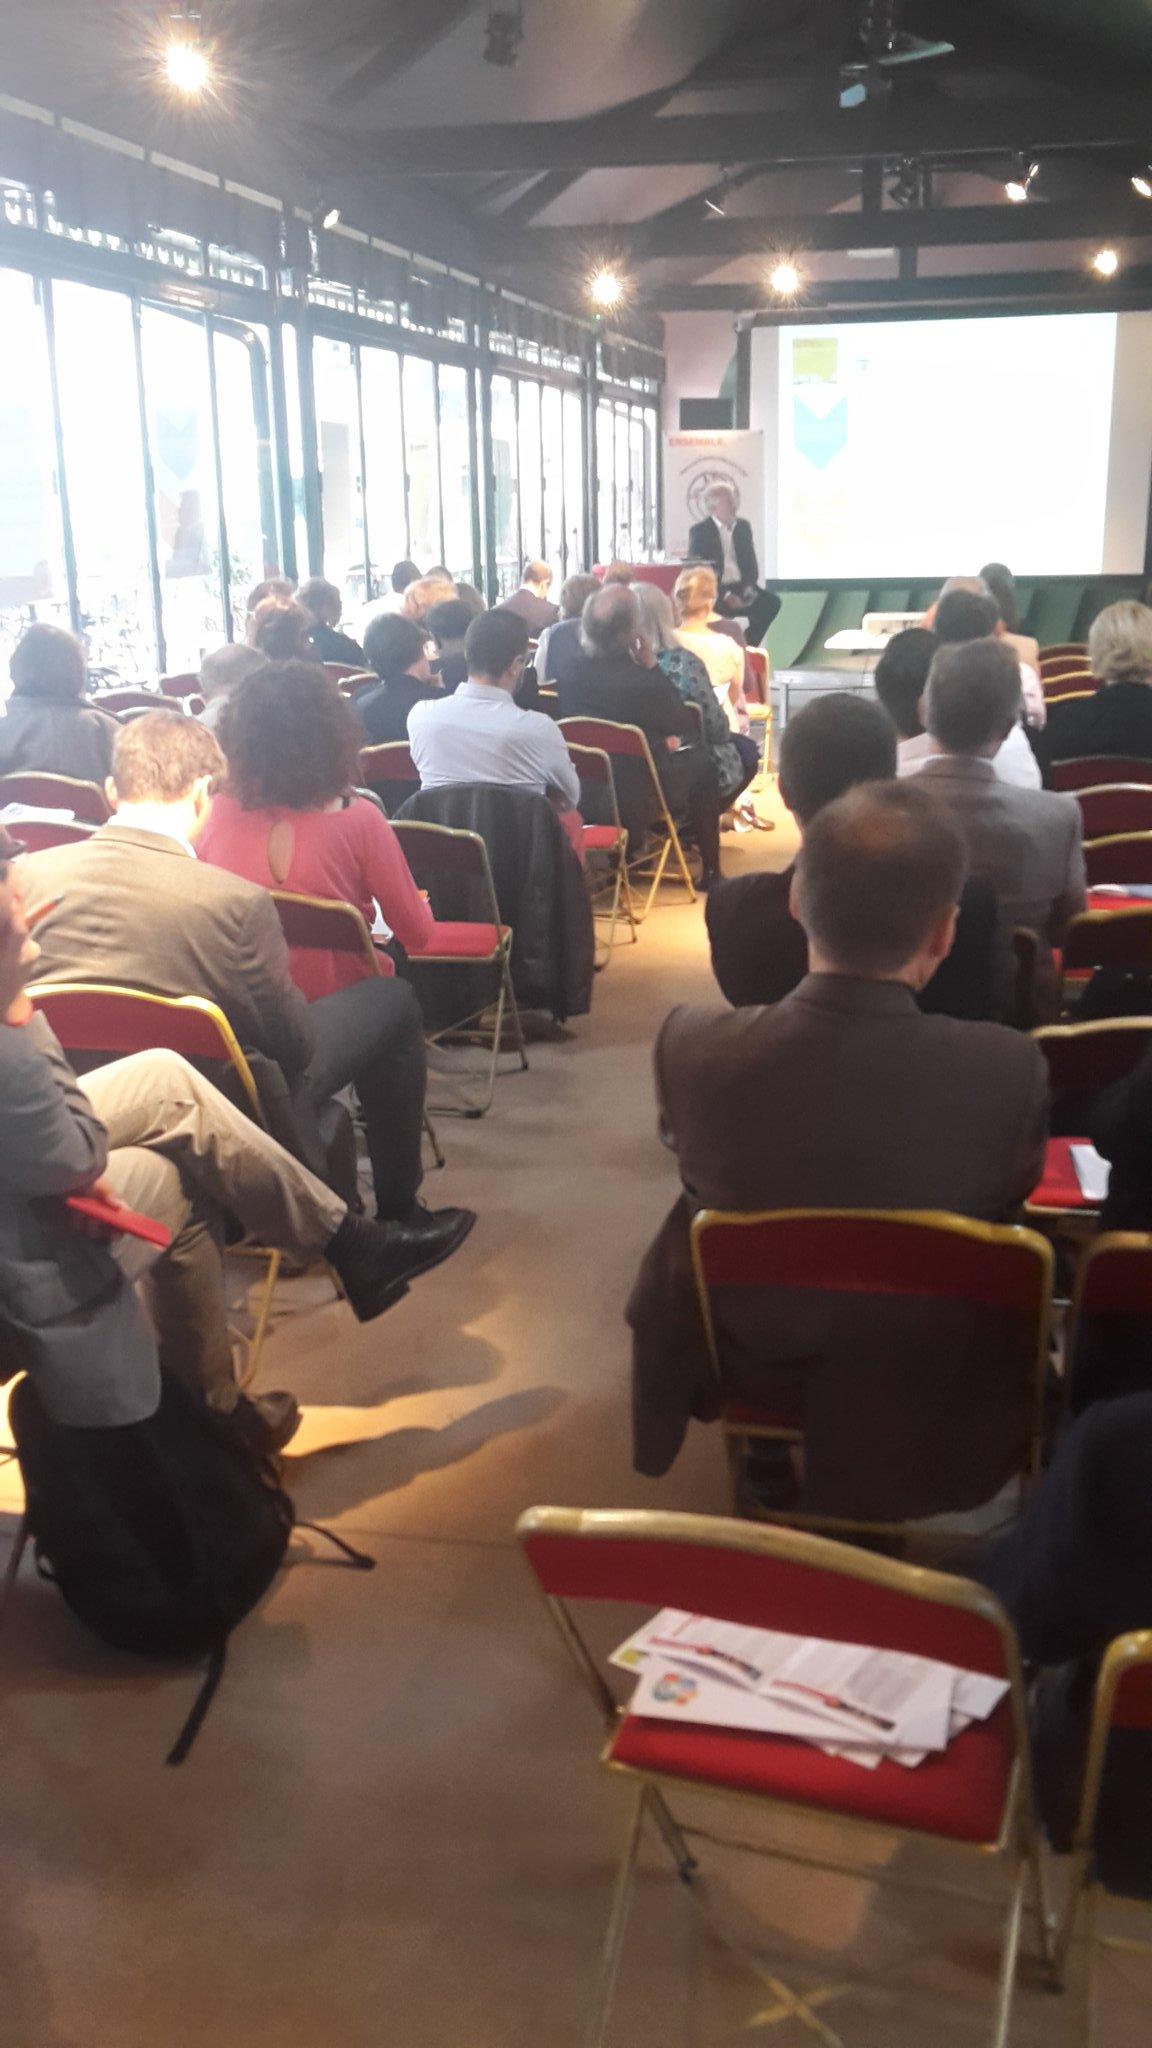 @GillesBerhault présidant sa dernière AG bon anniversaire @Comite21 ! #ODD + interrégional #comite21ans #qualitéair https://t.co/iwAsbUwdTl